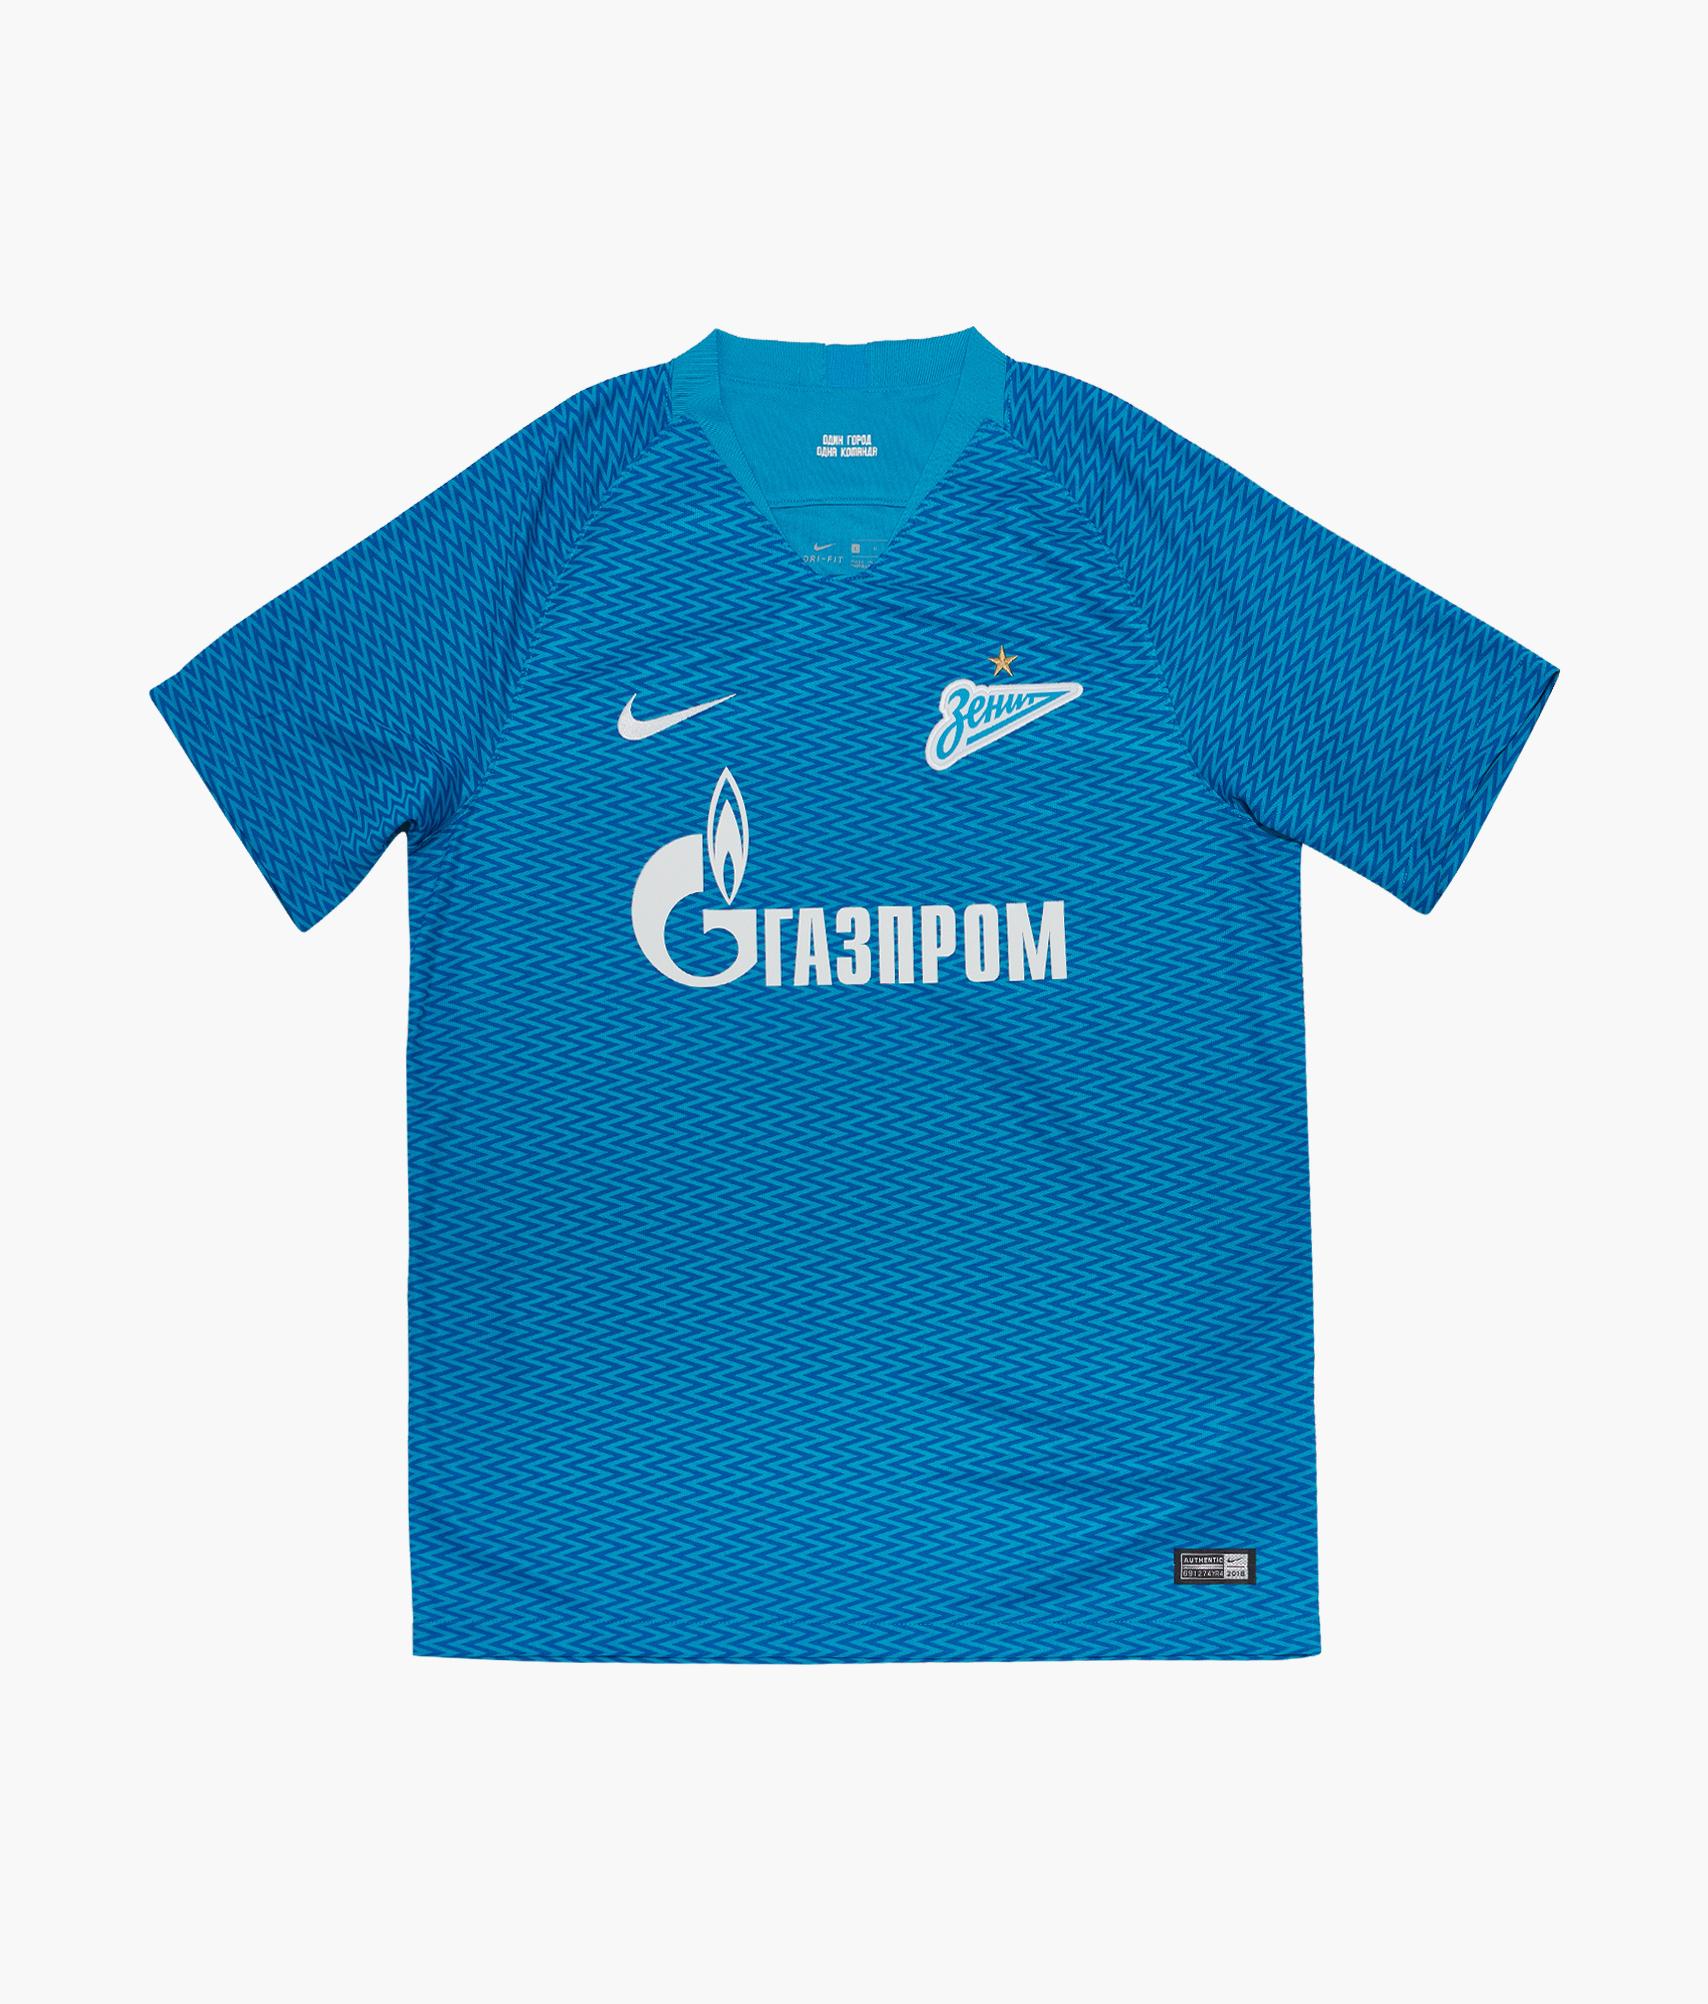 Домашняя игровая футболка Nike сезона 2018/2019 Nike Цвет-Синий nike nike ni464aghca01